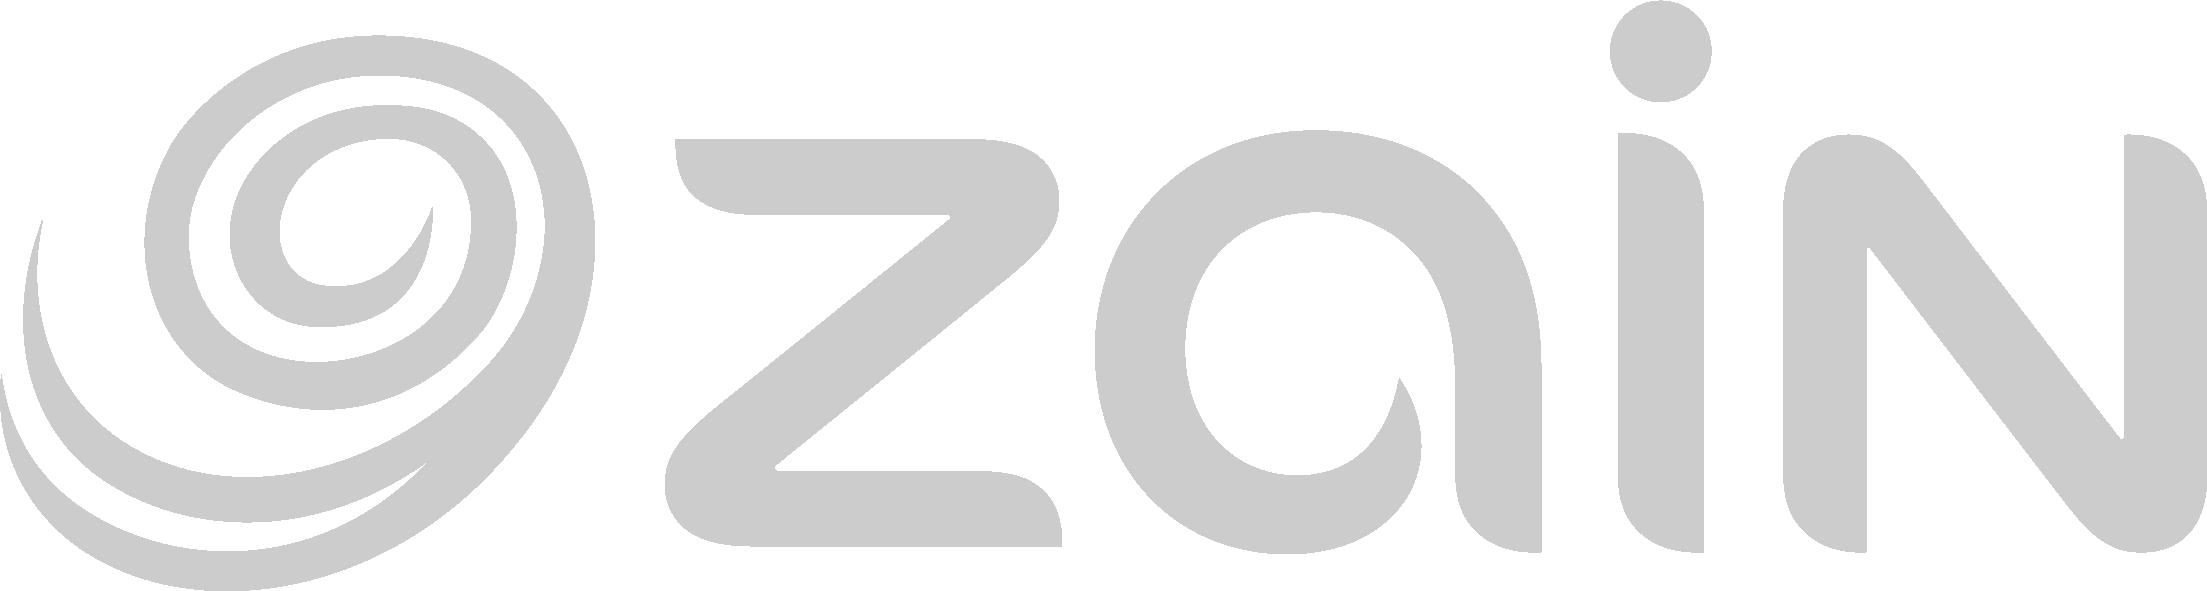 Zain Bahrain - Gamification use case logo